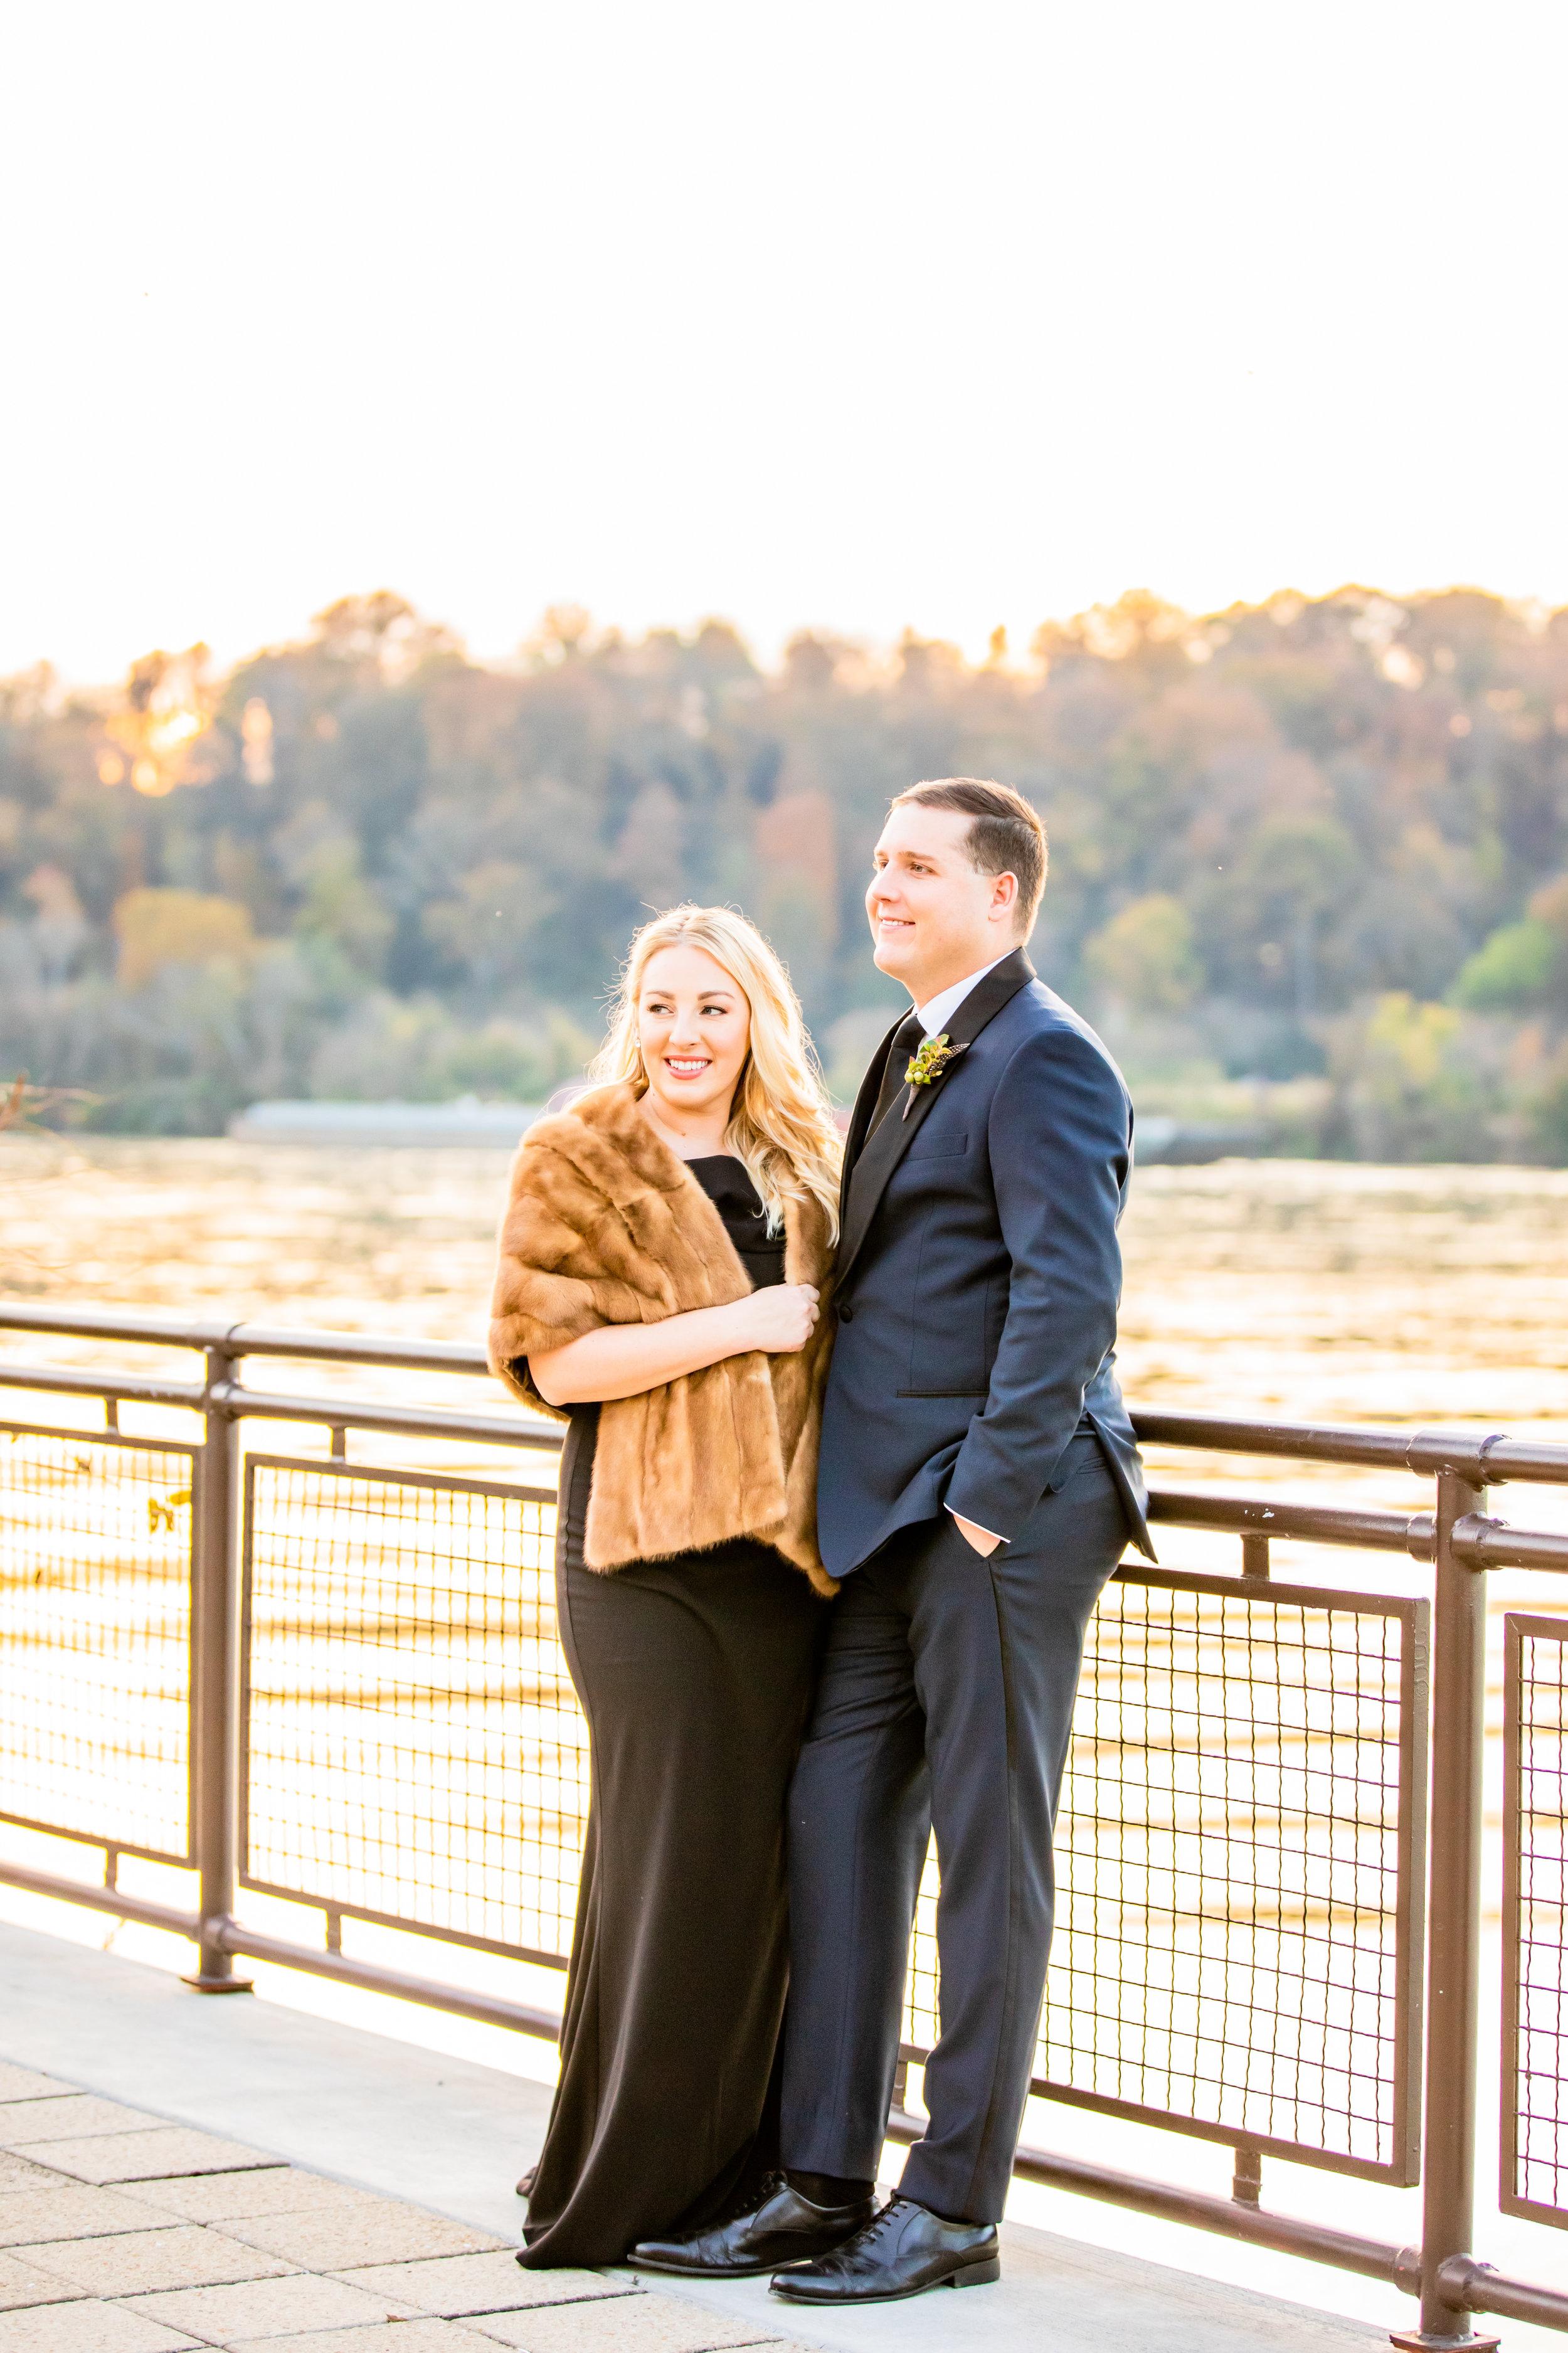 Wedding_Emily_Lester_Photography-259.jpg